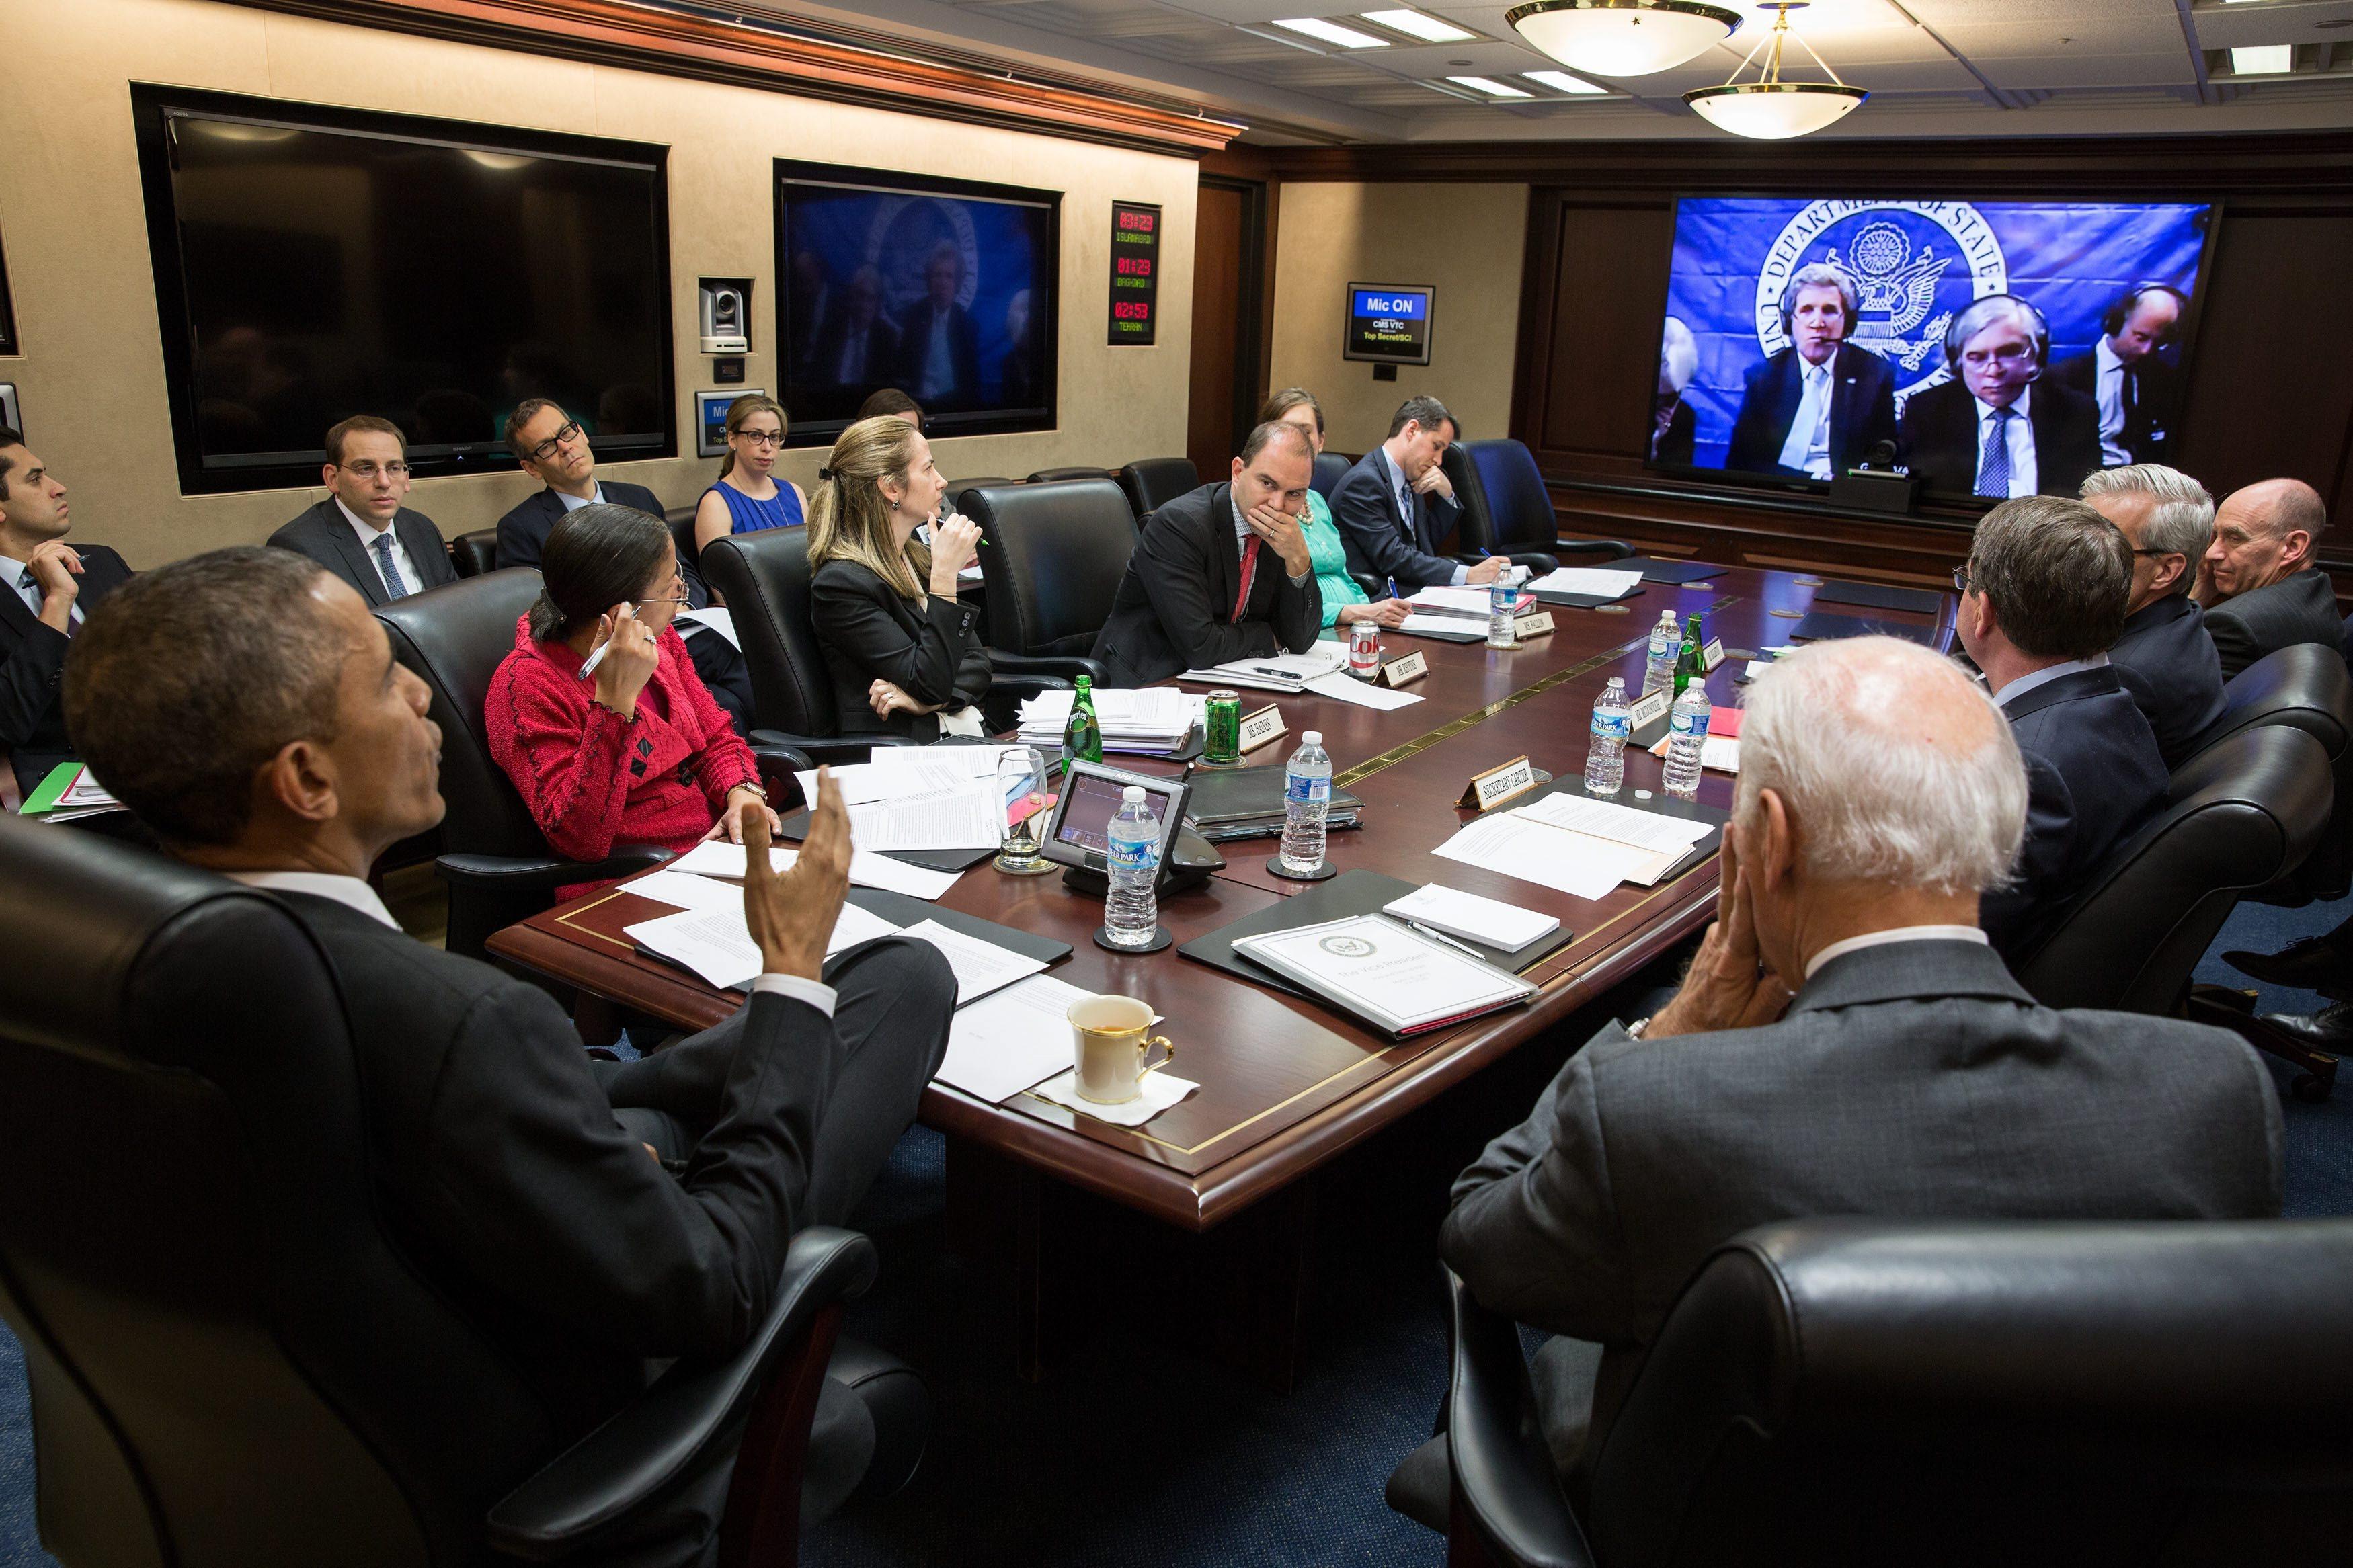 "title:""سحر نوروززاده کیست؟-http://anamnews.com/"" alt:""تیم اوباما در حال کنفرانس ویدیوئی با جان کری """